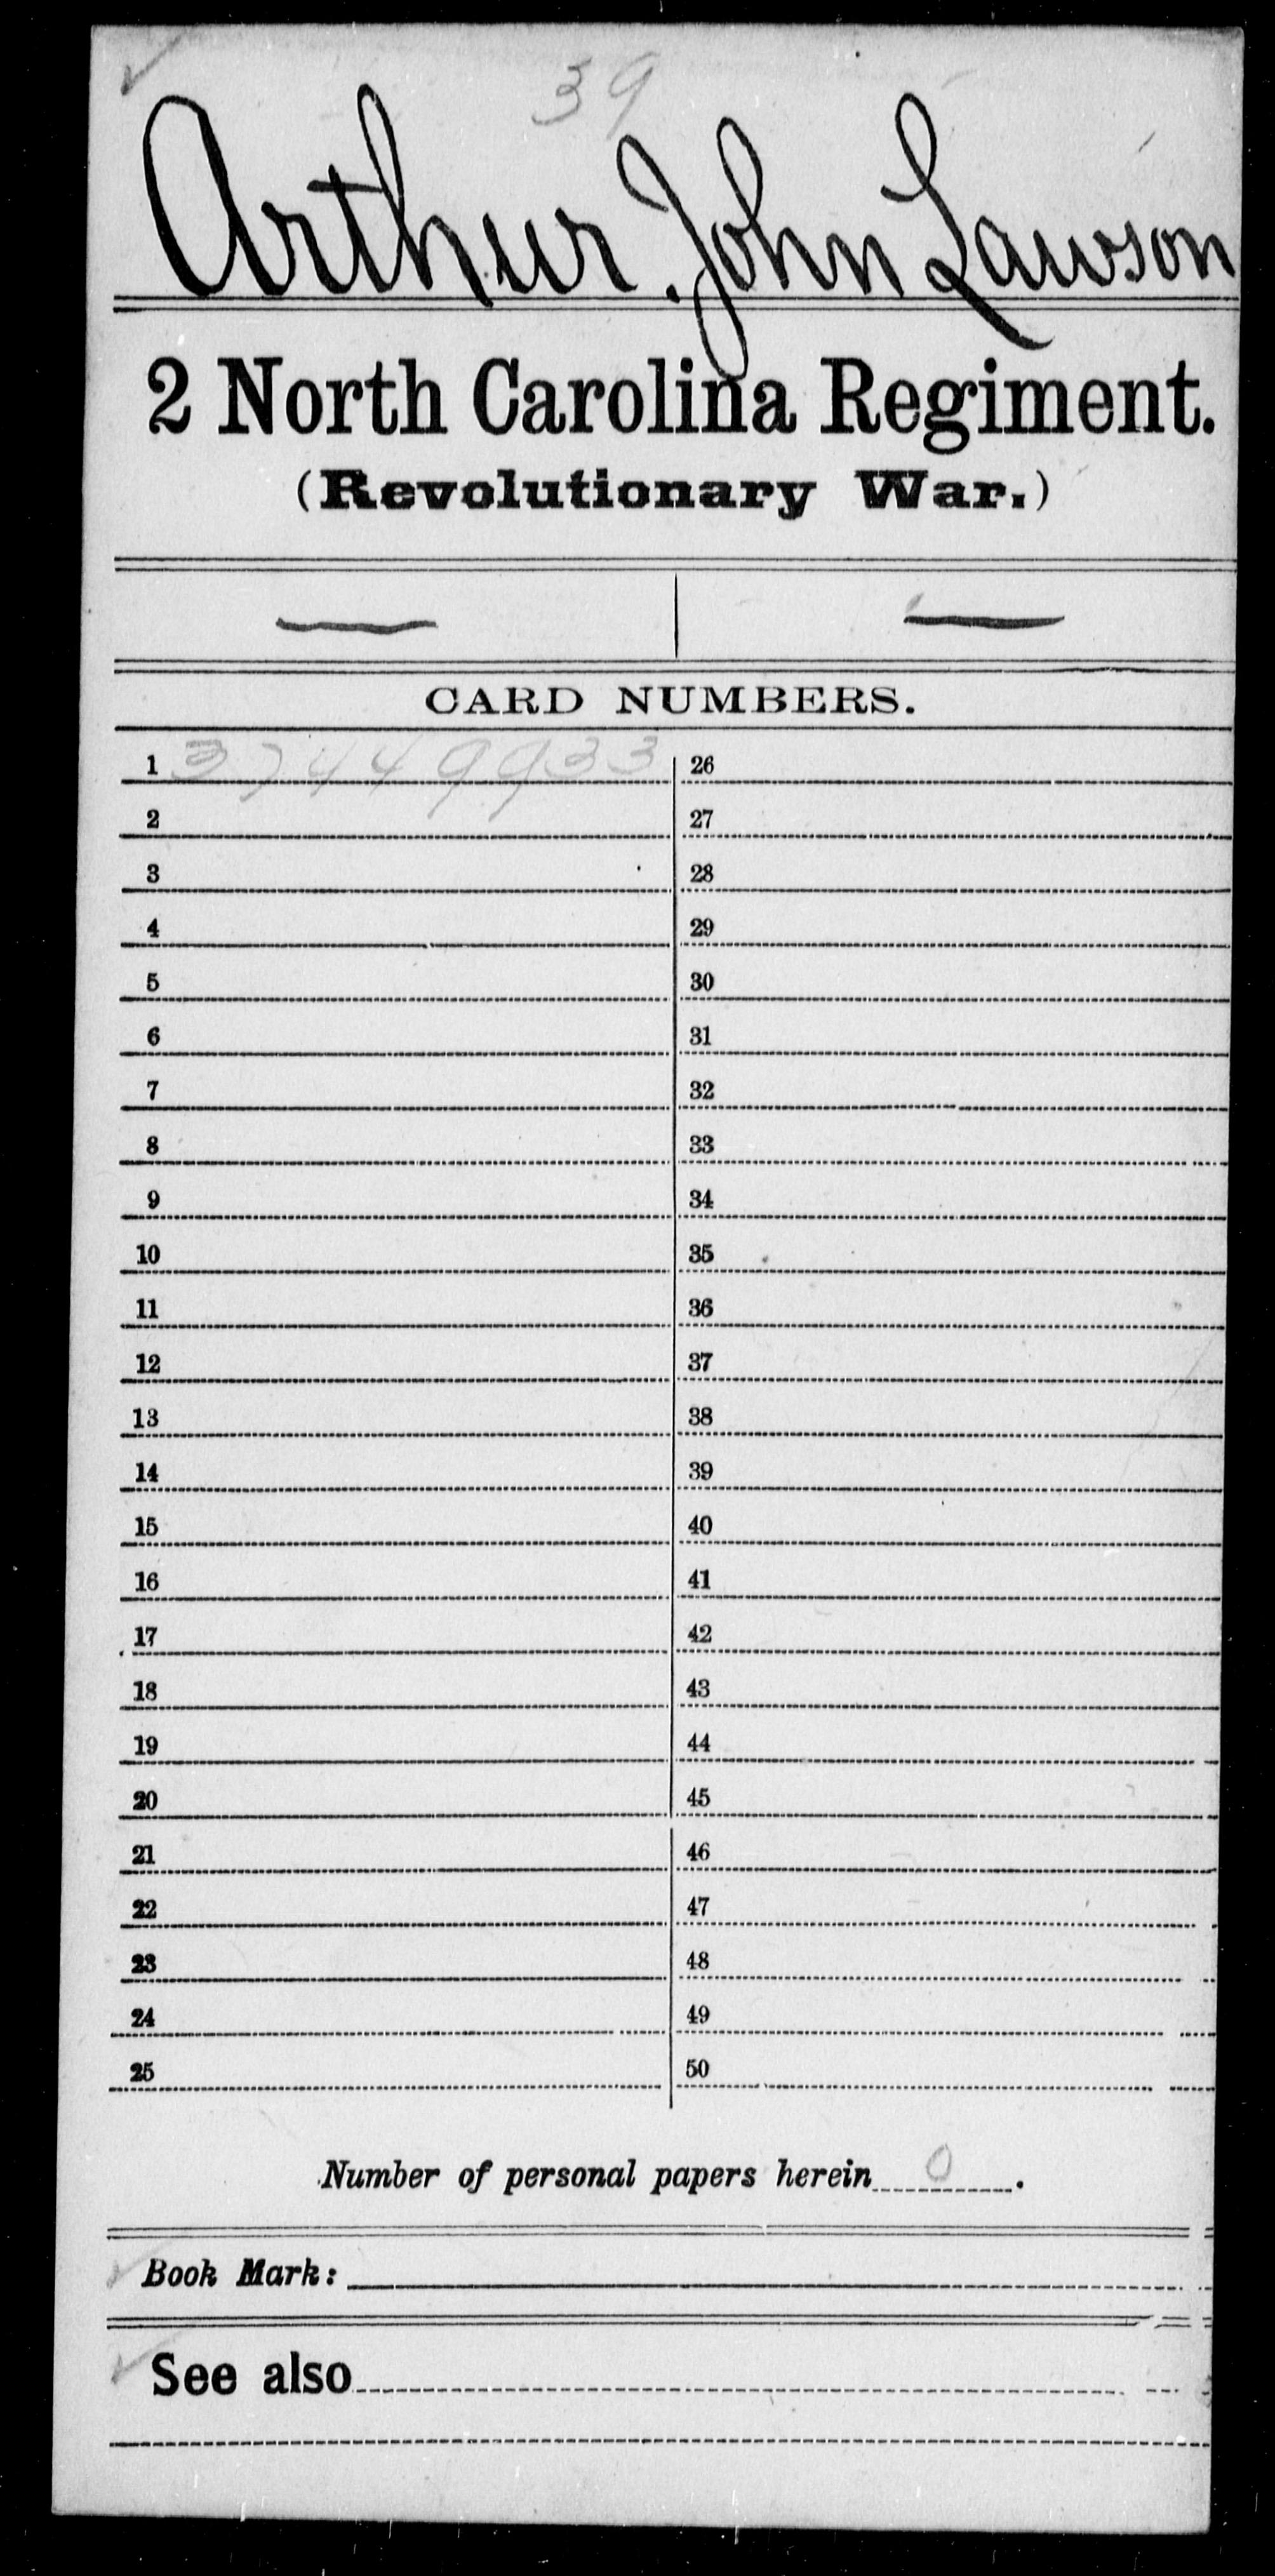 Arthur, John Lawson - North Carolina - Second Regiment